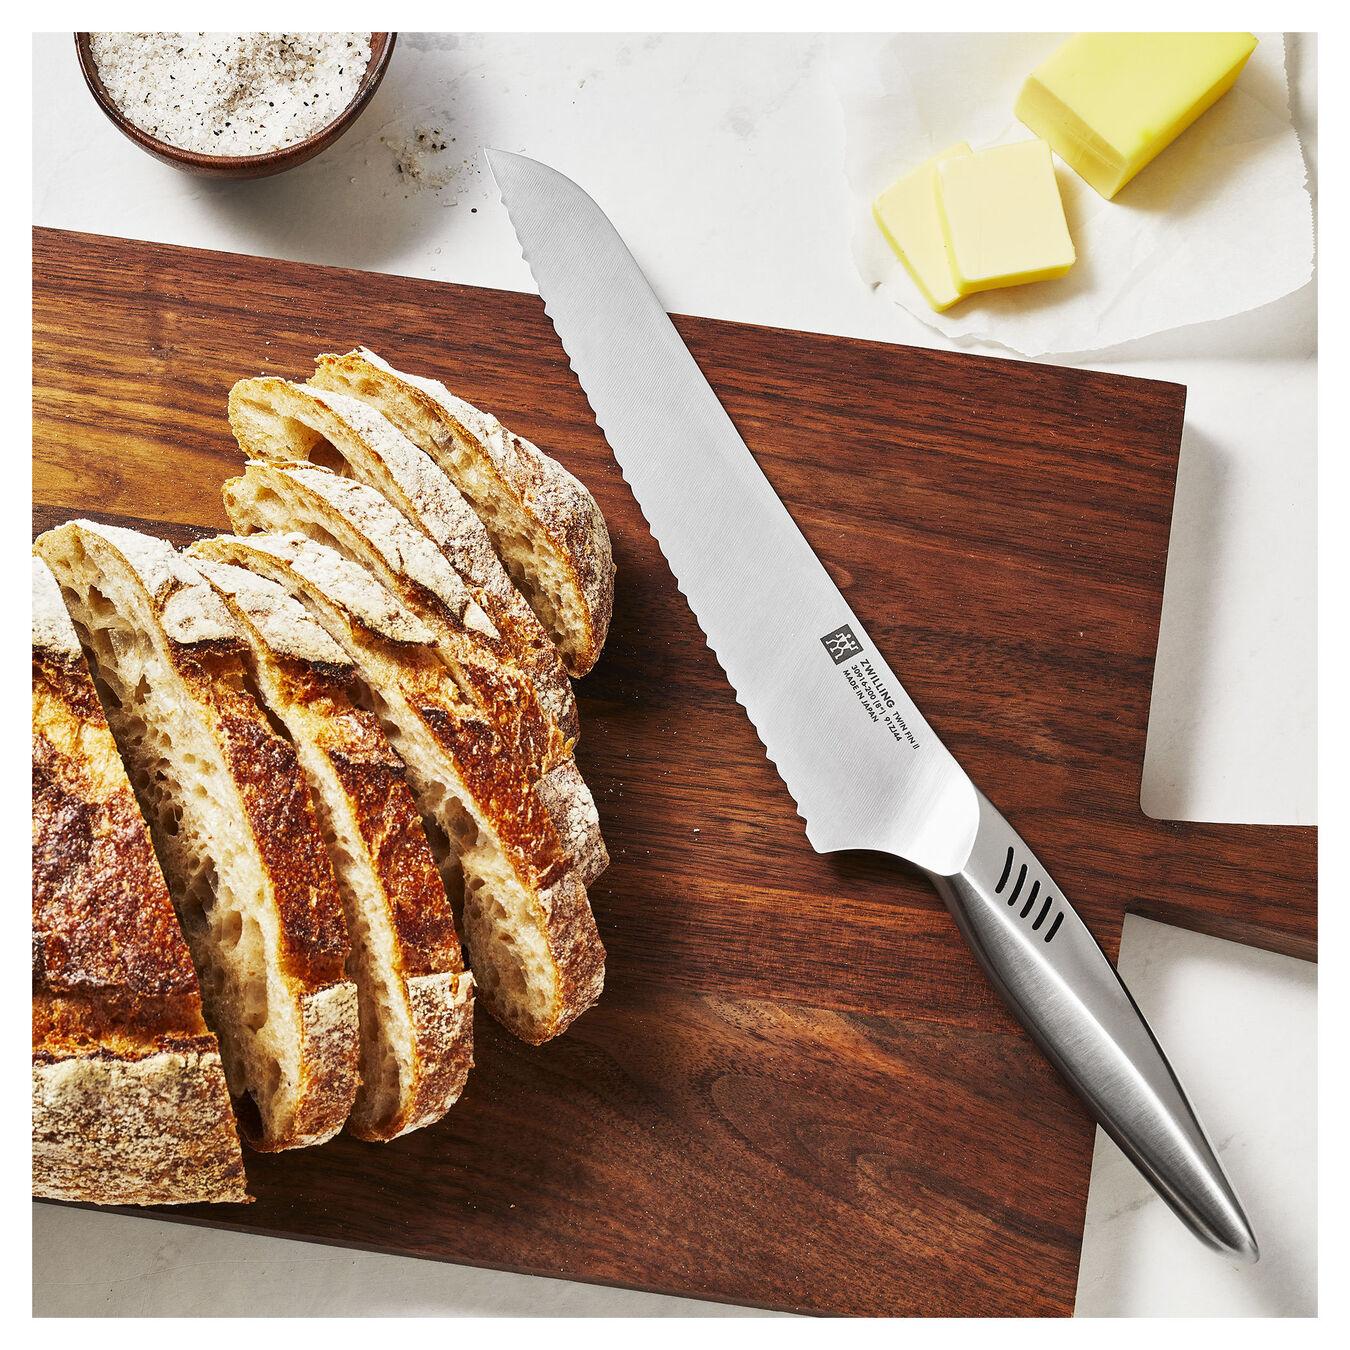 Brotmesser 20 cm, Edelstahl,,large 2